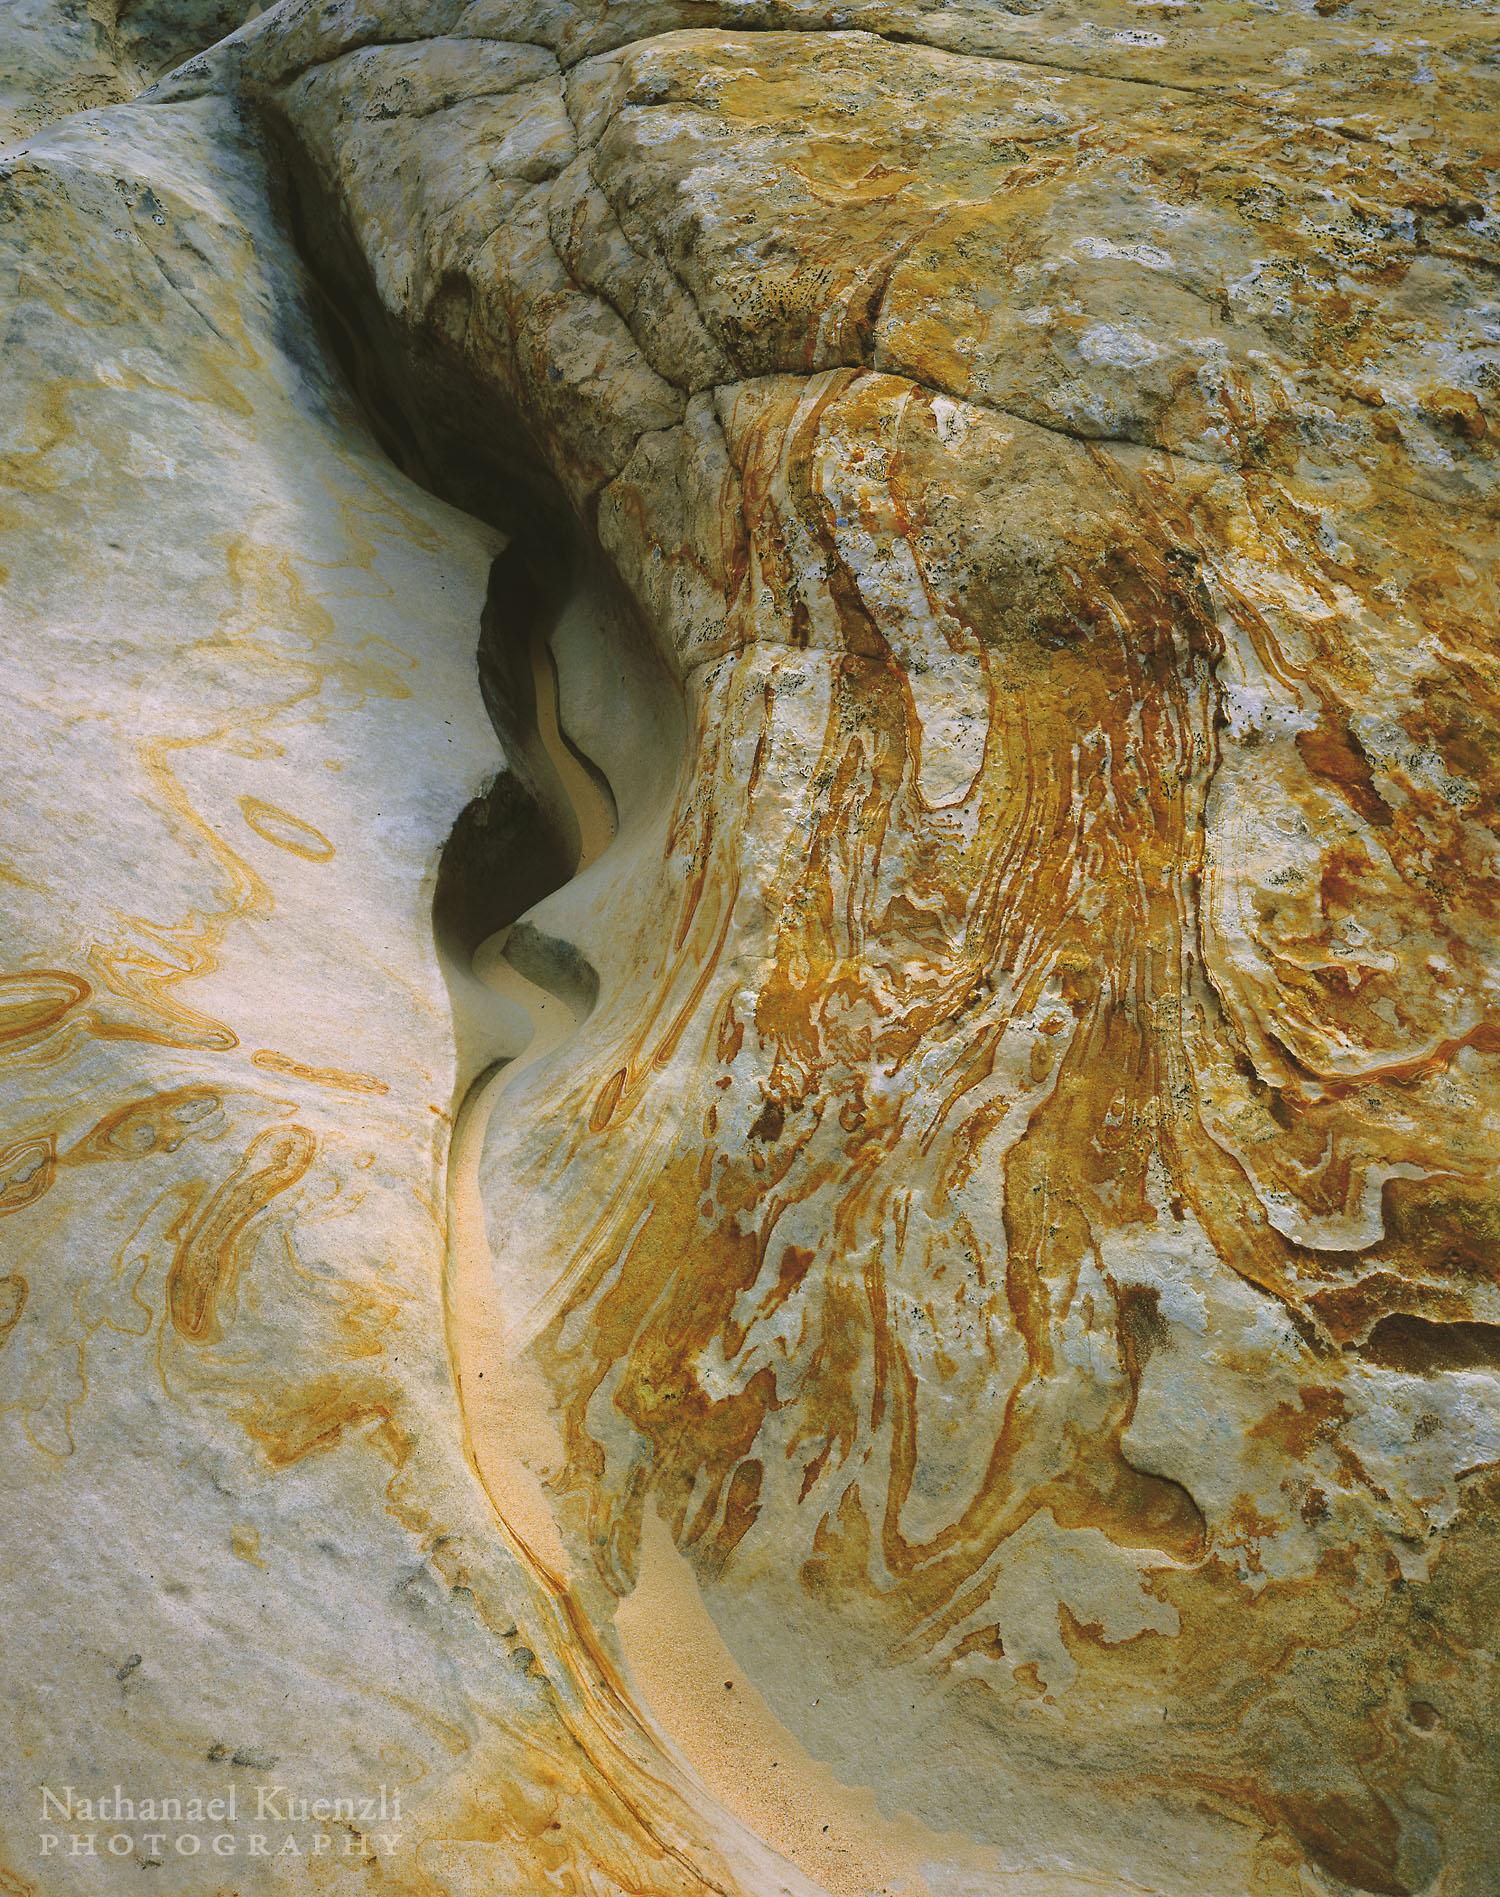 Creek Bottom Detail, Surprise Canyon, Capitol Reef National Park, Utah, May 2005